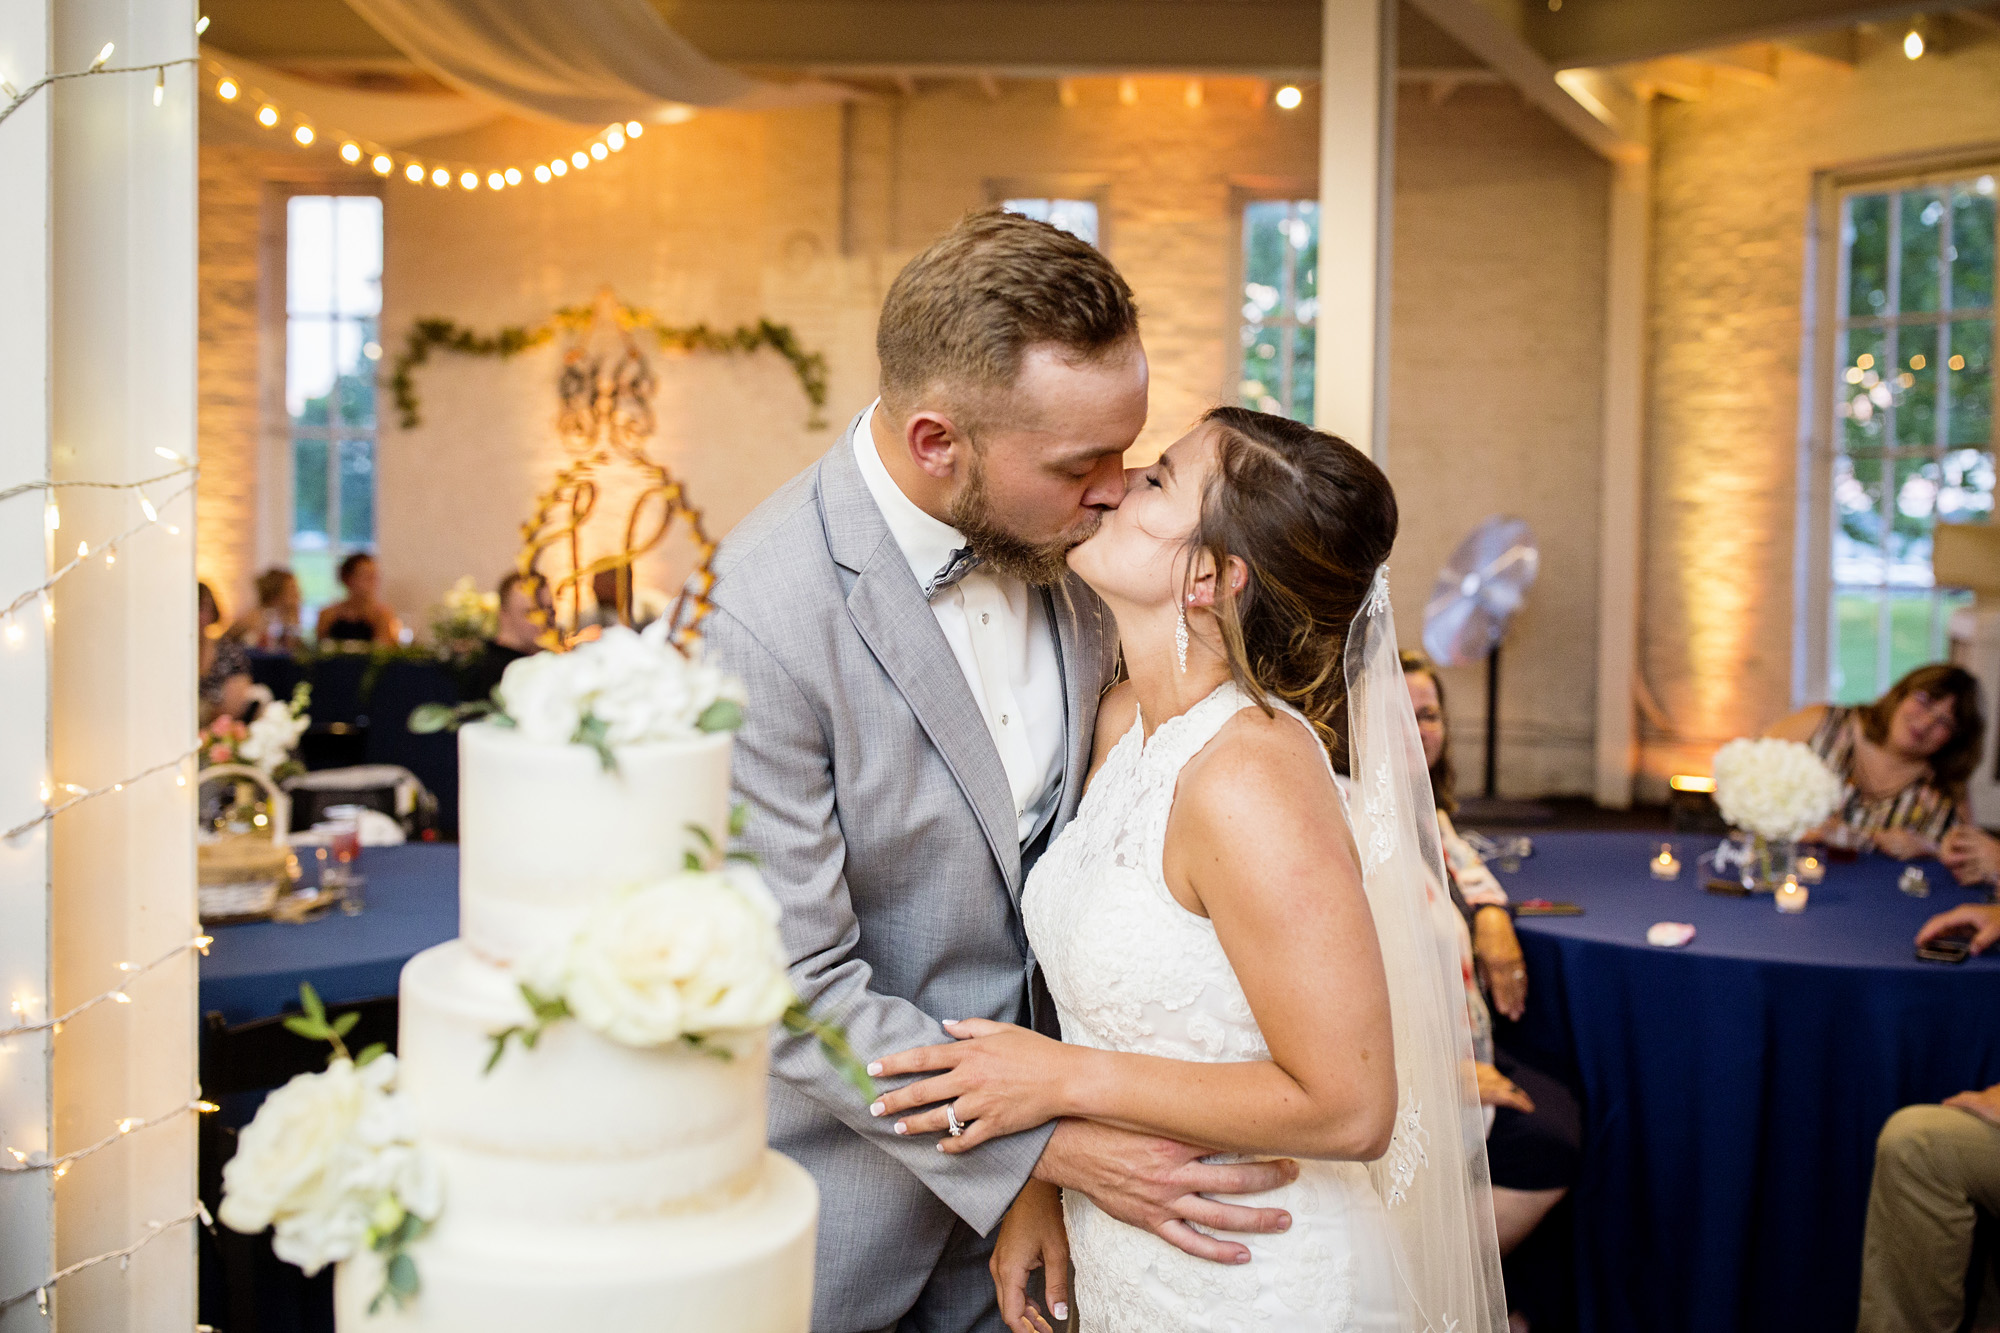 Seriously_Sabrina_Photography_Lexington_Kentucky_Round_Barn_Red_Mile_Stable_of_Memories_Wedding_Hart_114.jpg